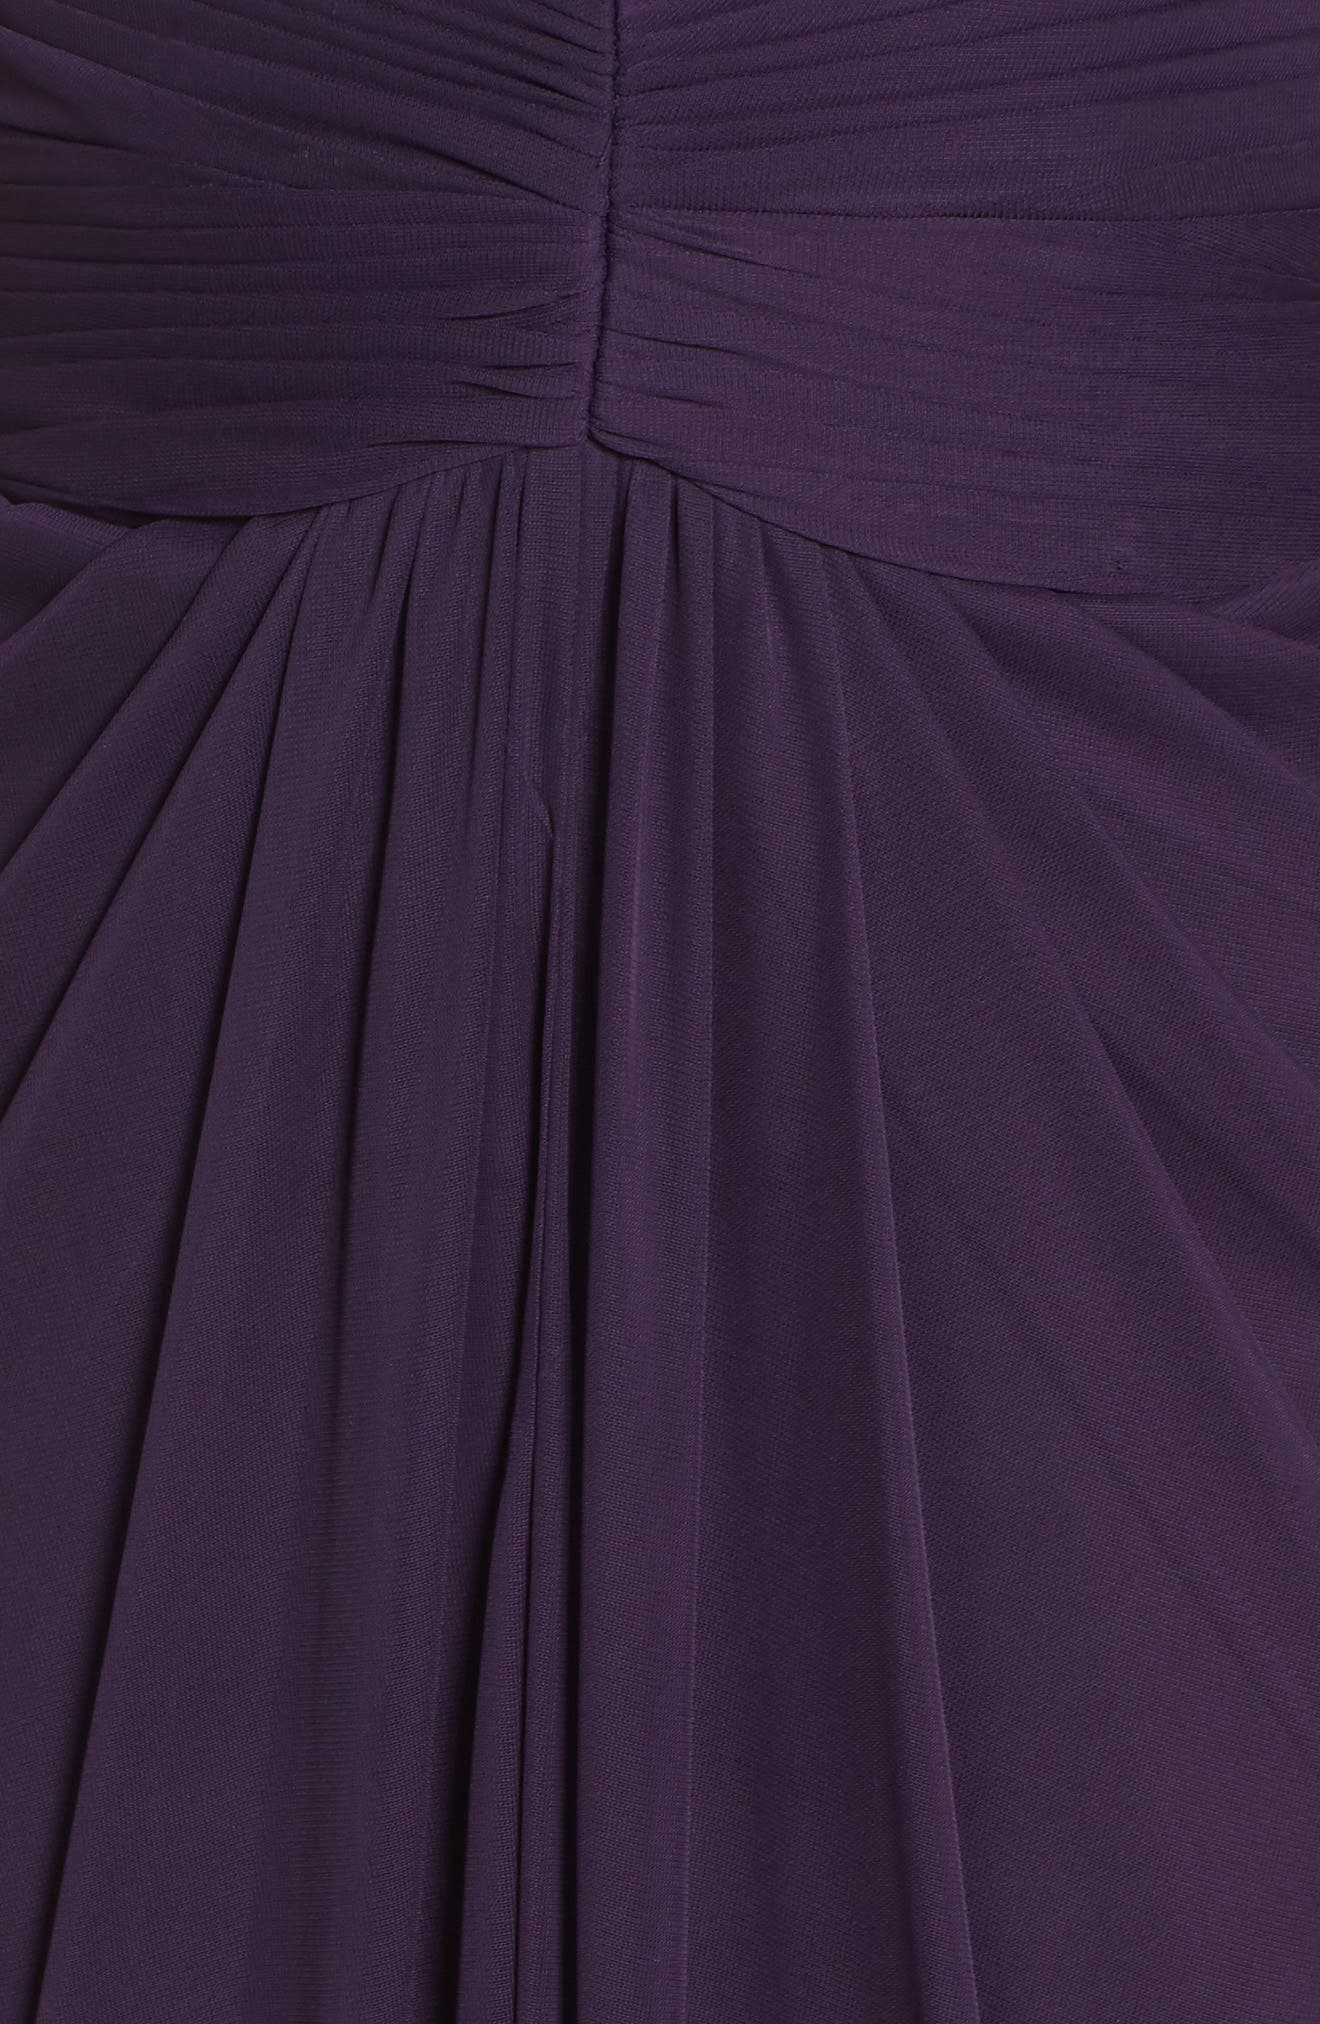 Lace Yoke Drape Gown,                             Alternate thumbnail 13, color,